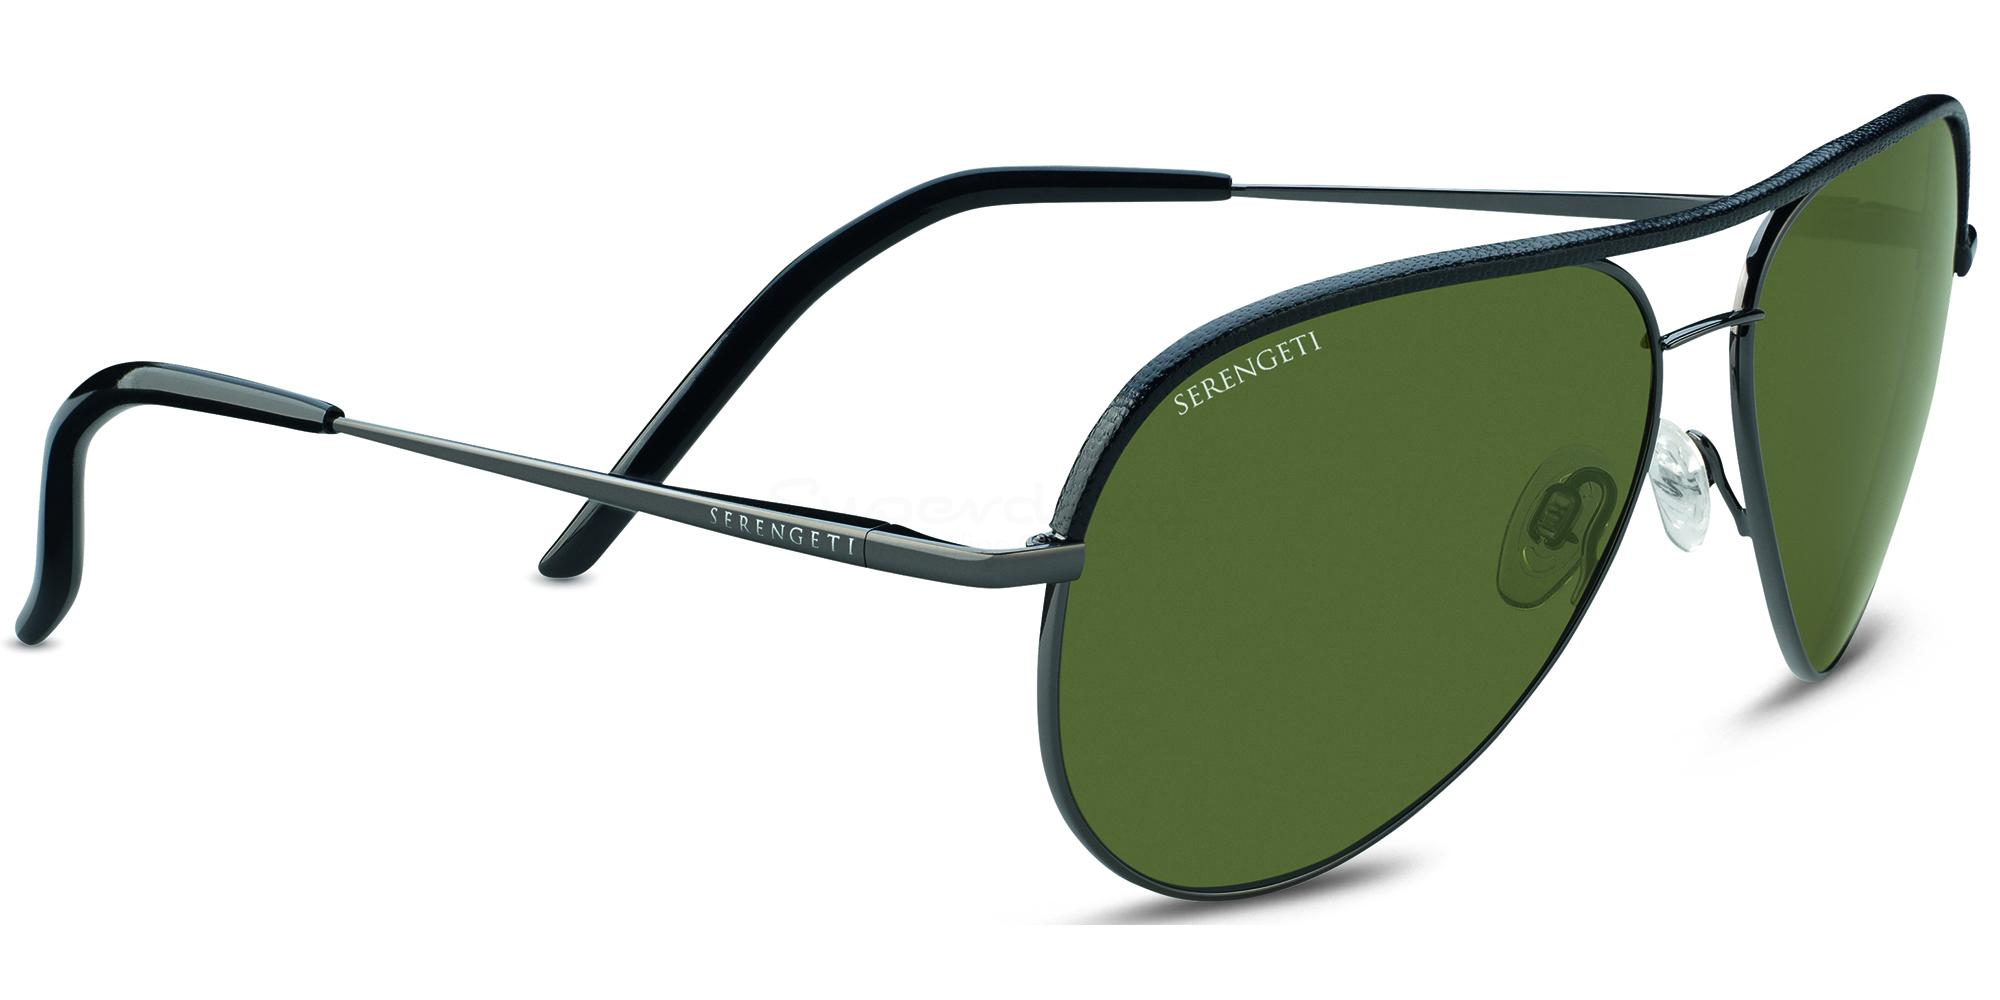 8548 CARRARA Leather Sunglasses, Serengeti